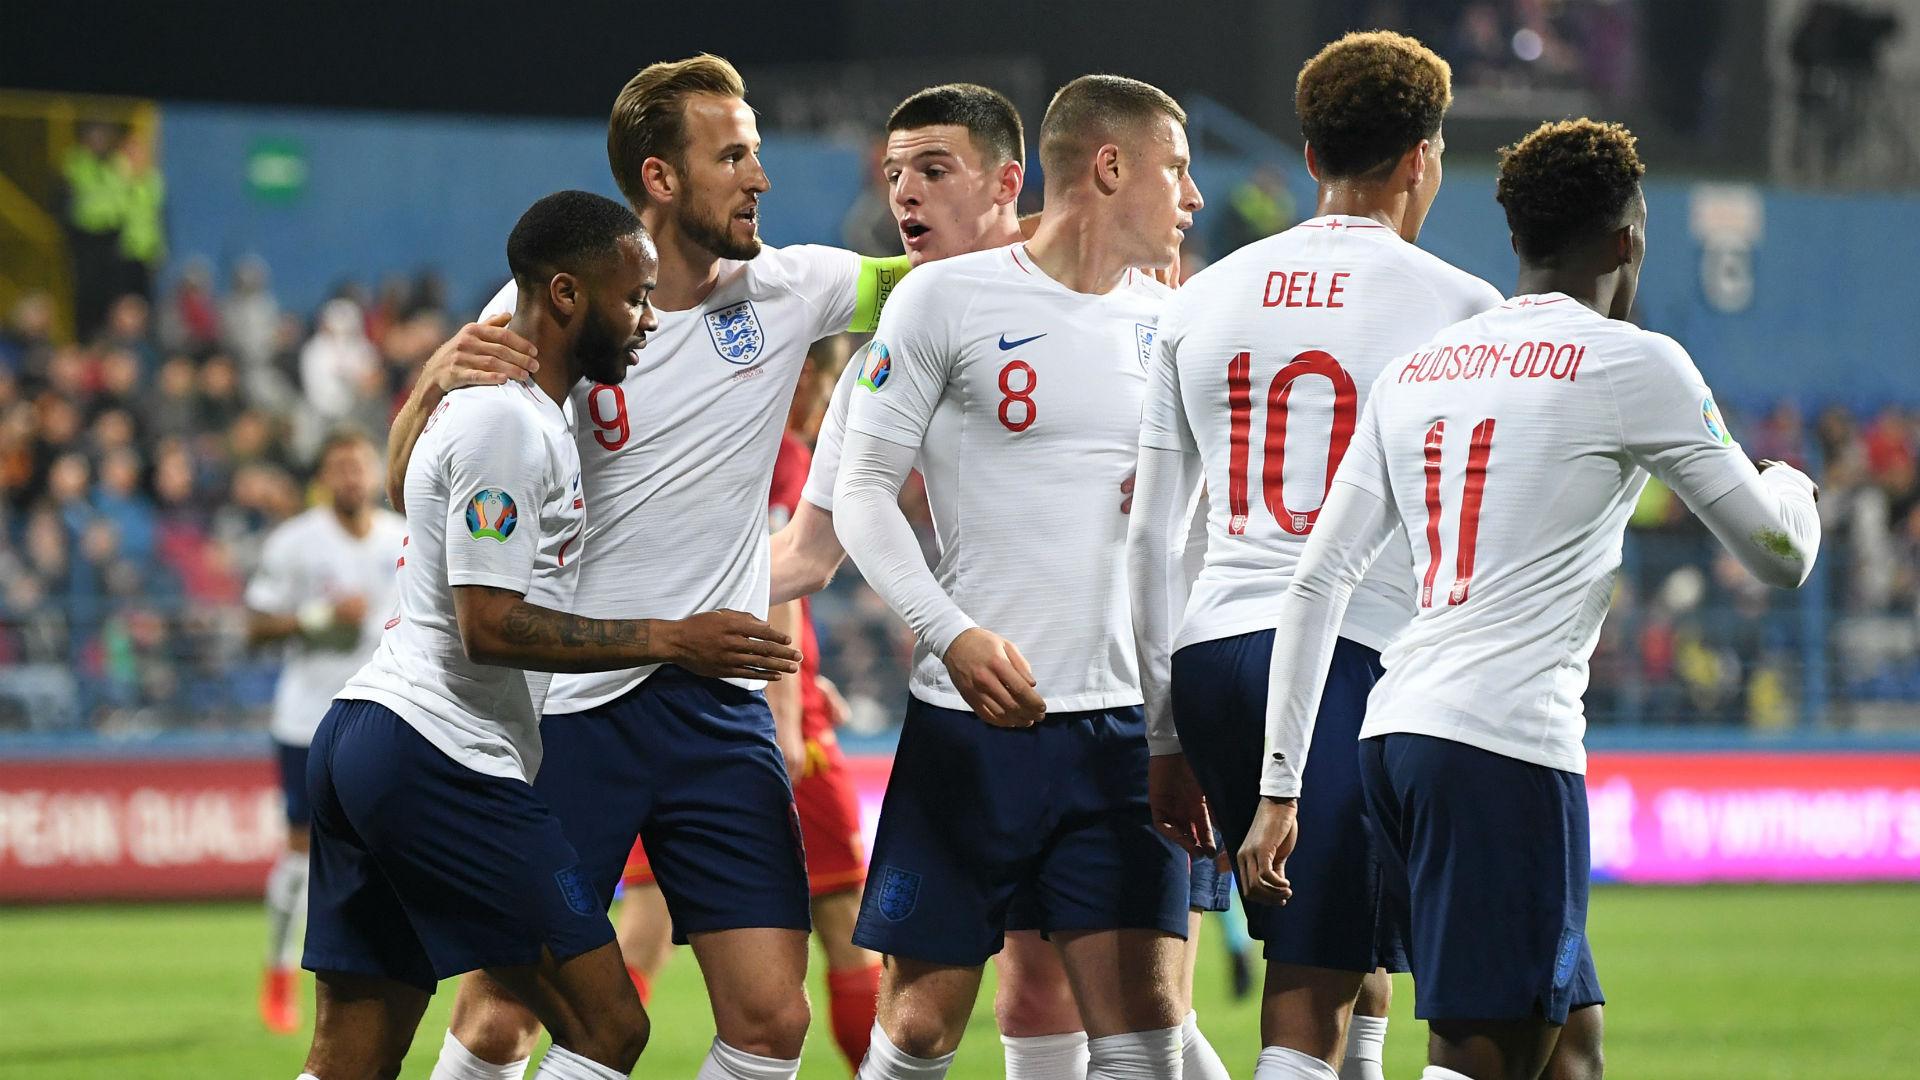 Montenegro 1 England 5: Barkley stars as rampant Three Lions hit five again